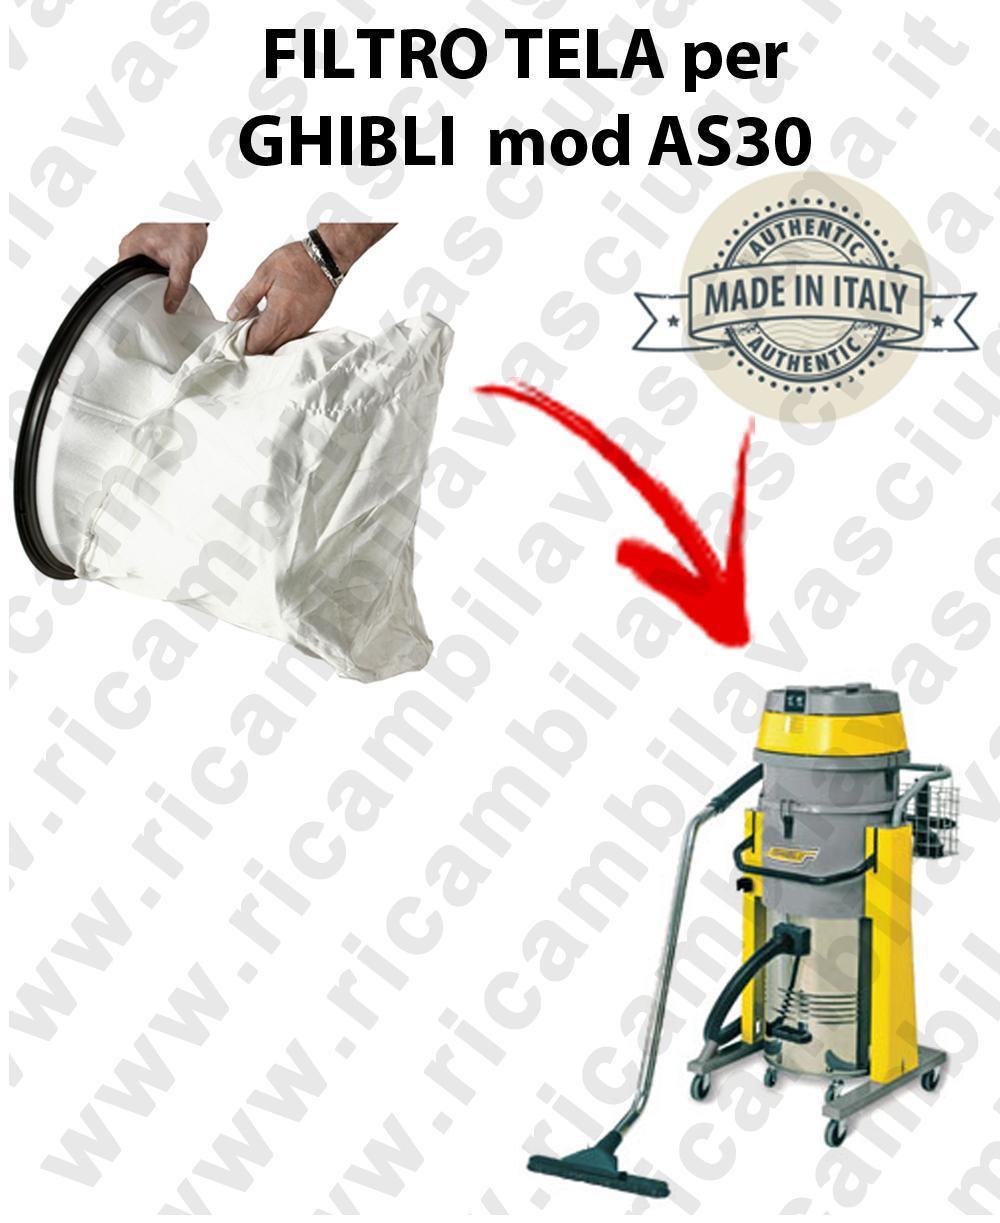 NYLON filter bag cod: 3001220 for vacuum cleaner GHIBLI model AS30